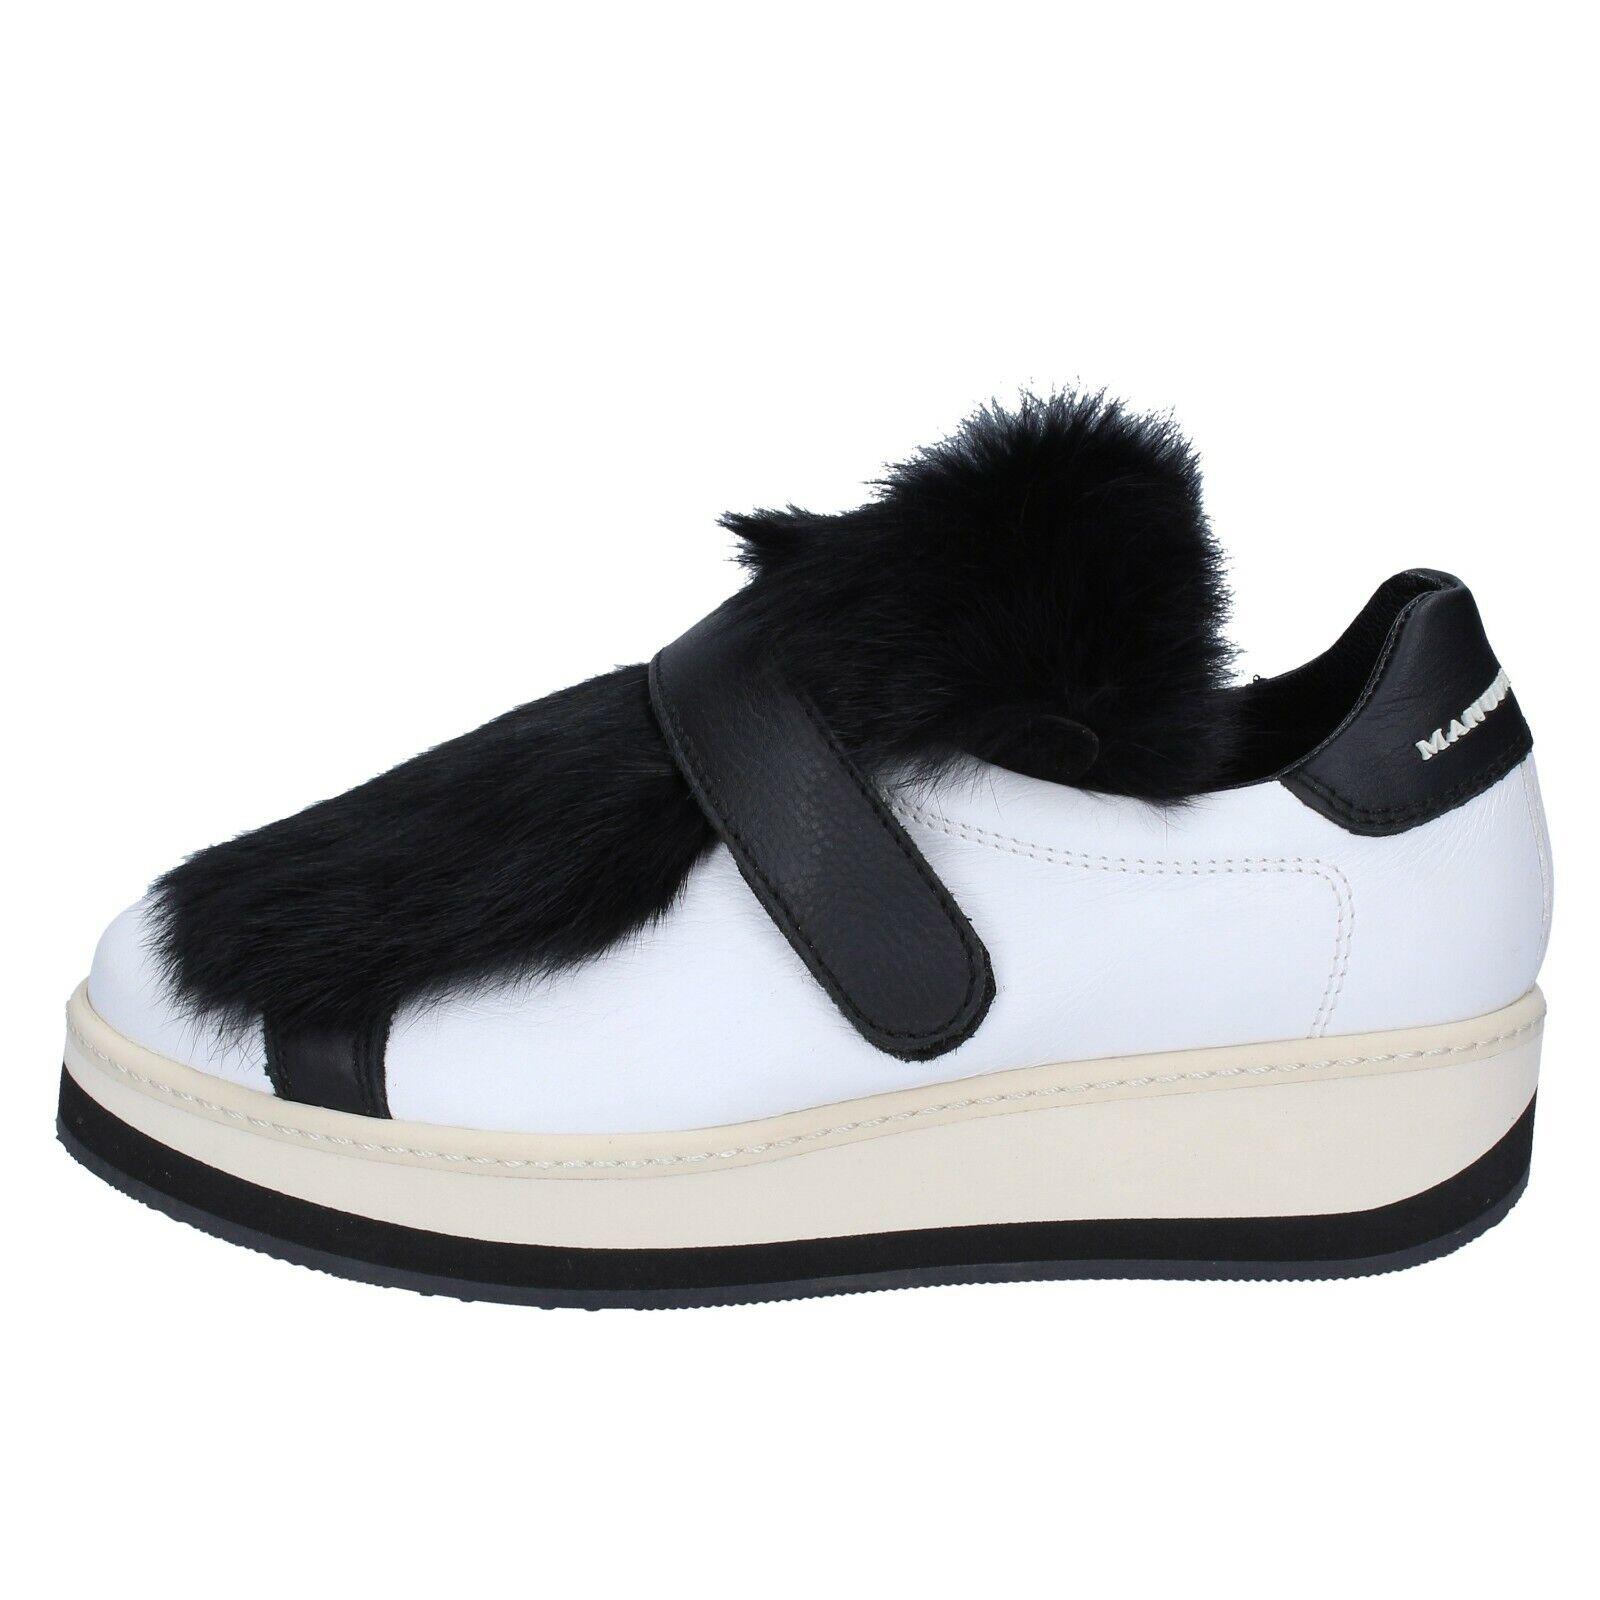 Chaussures Femmes Femmes Femmes Manuel Barcelo 6 (UE 36) Baskets Noir en Cuir Blanc BS330-36 c89560